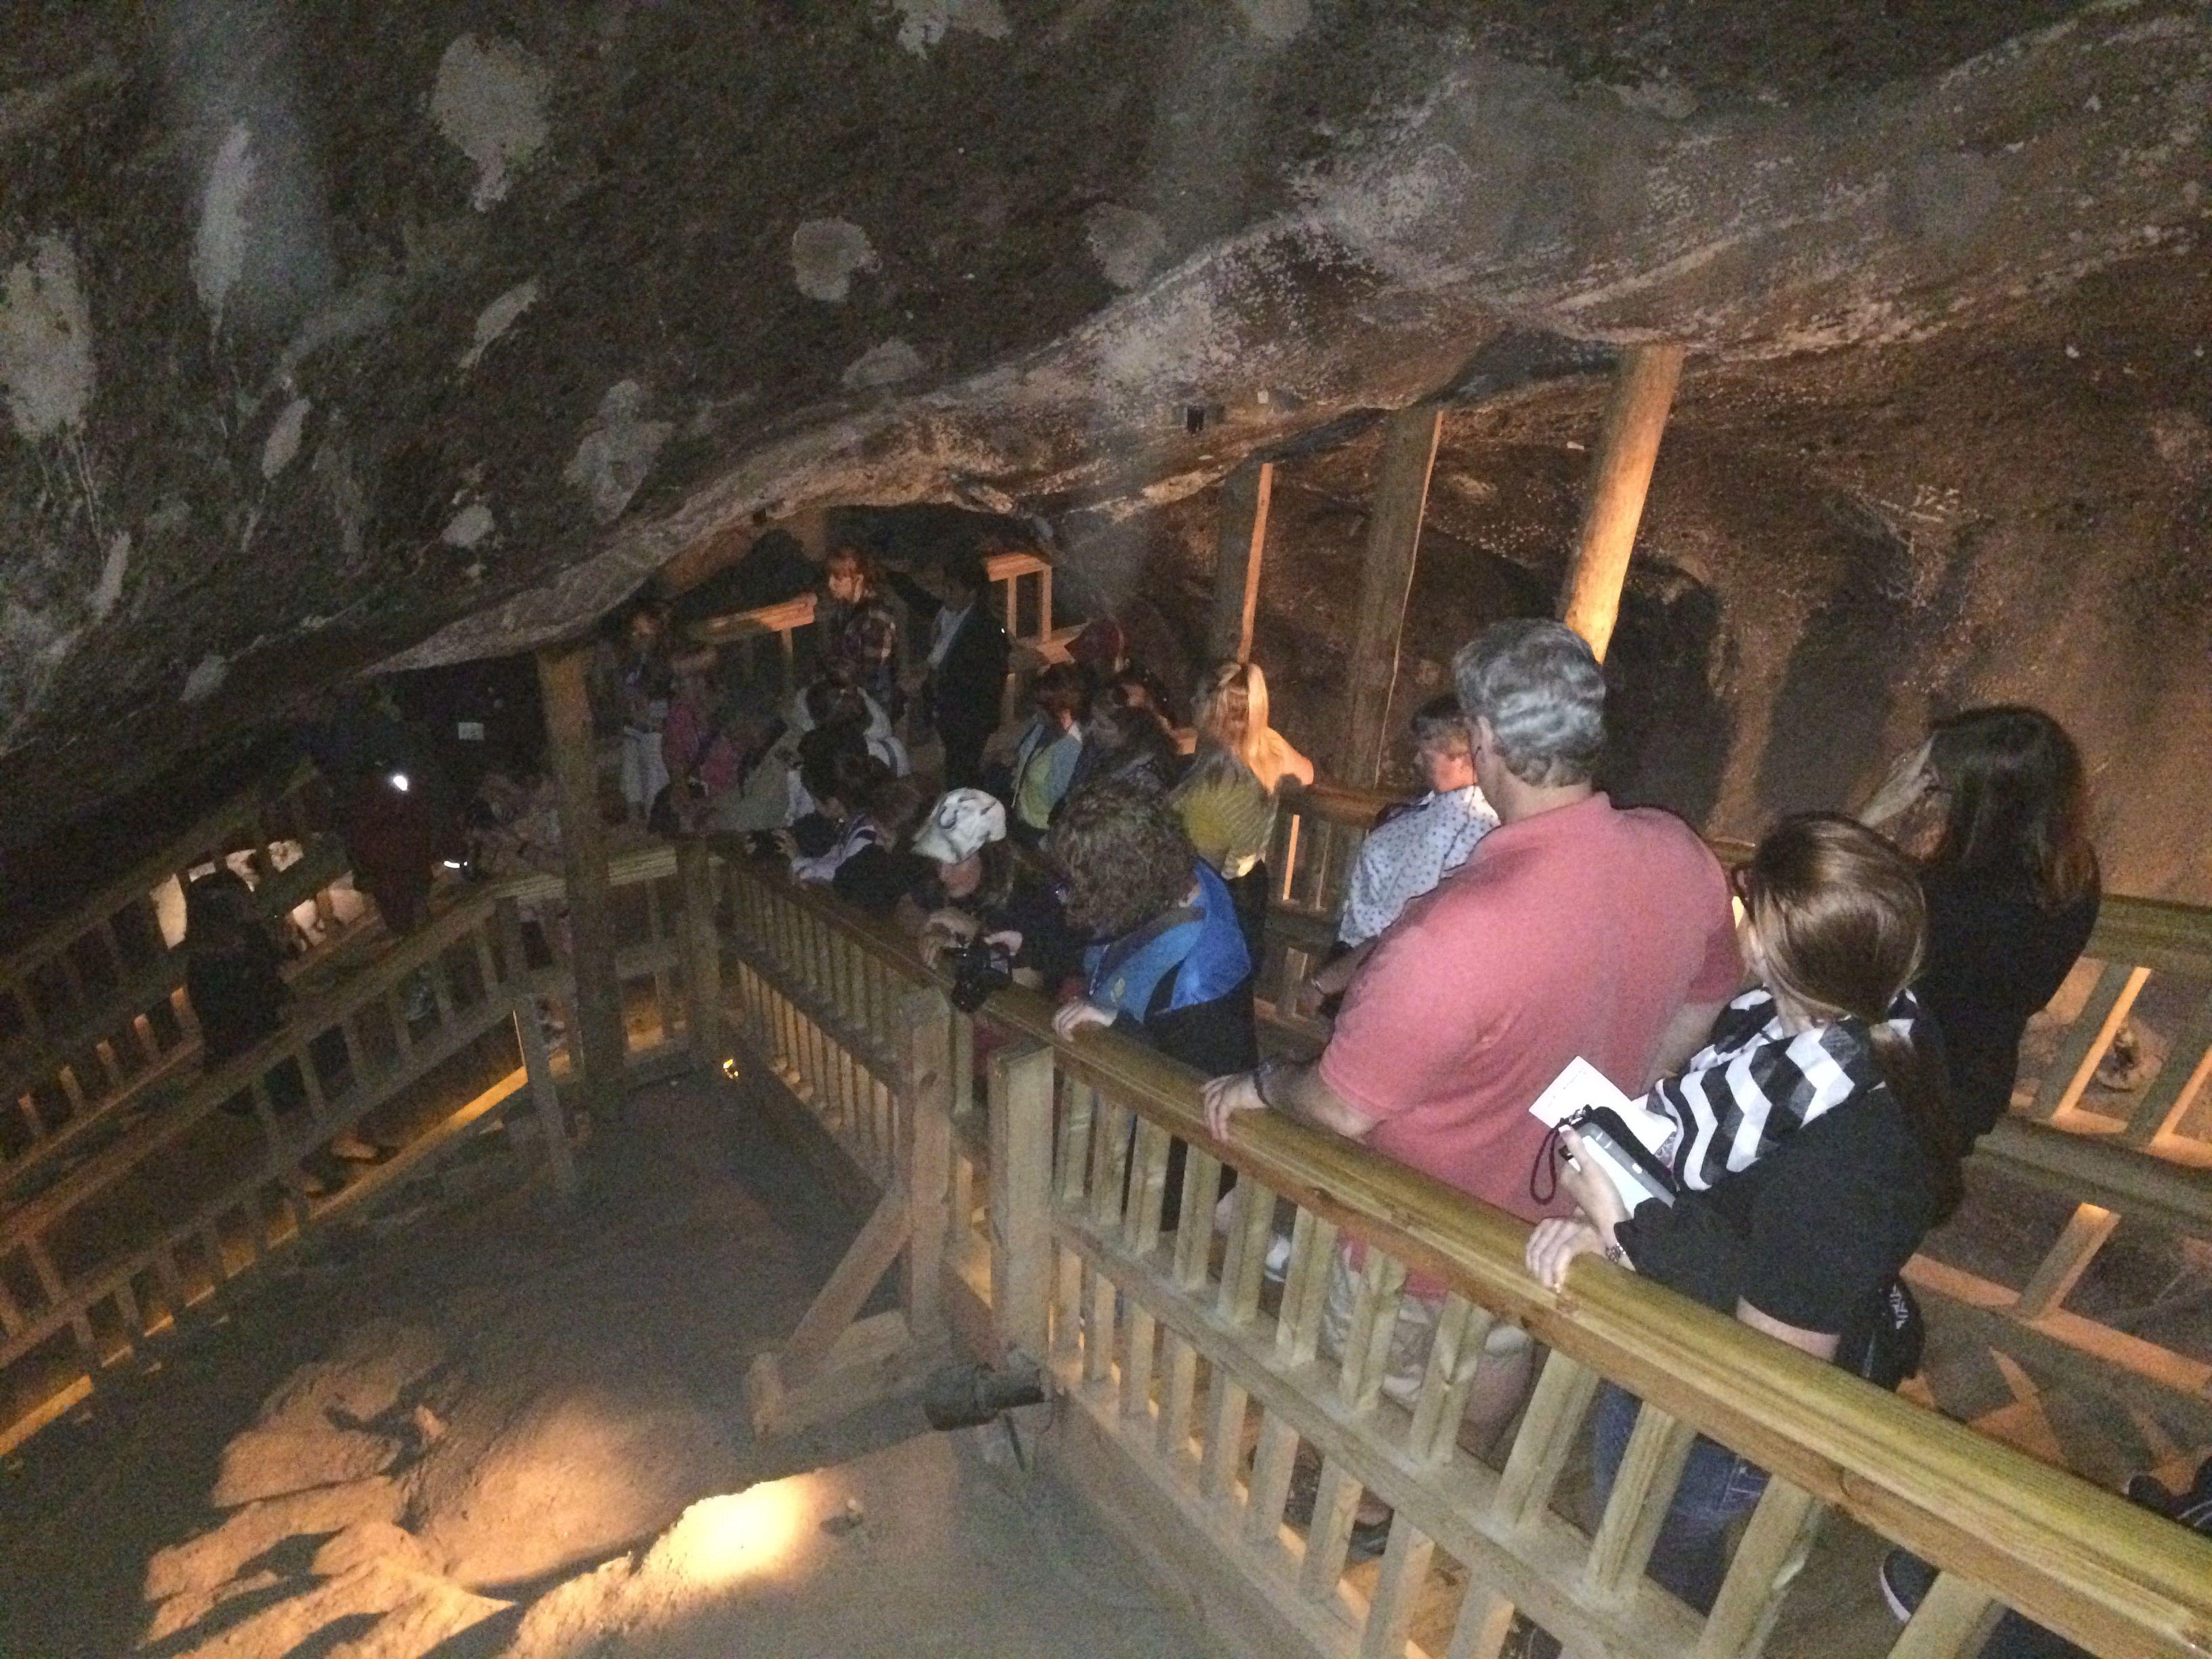 Lower Levels of the Wieliczka Salt Mine